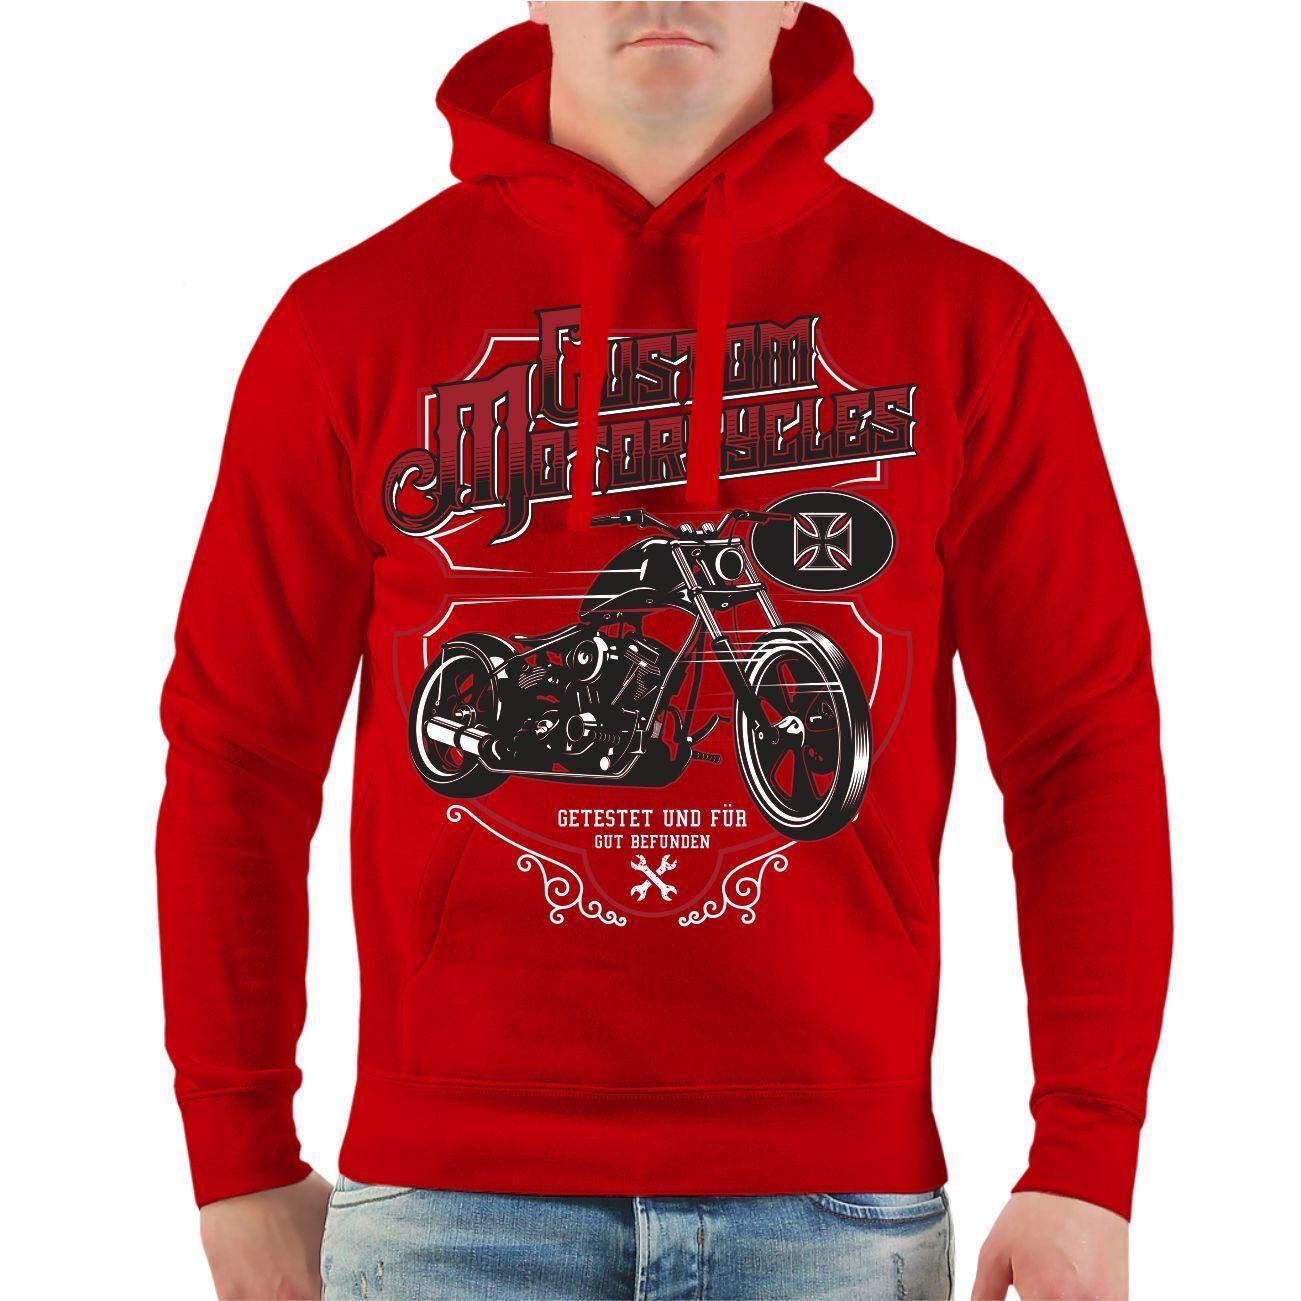 Kapuzenpullover Custom Motorcycles Motorrad Chopper Biker Spruch Geschenk Hoodie